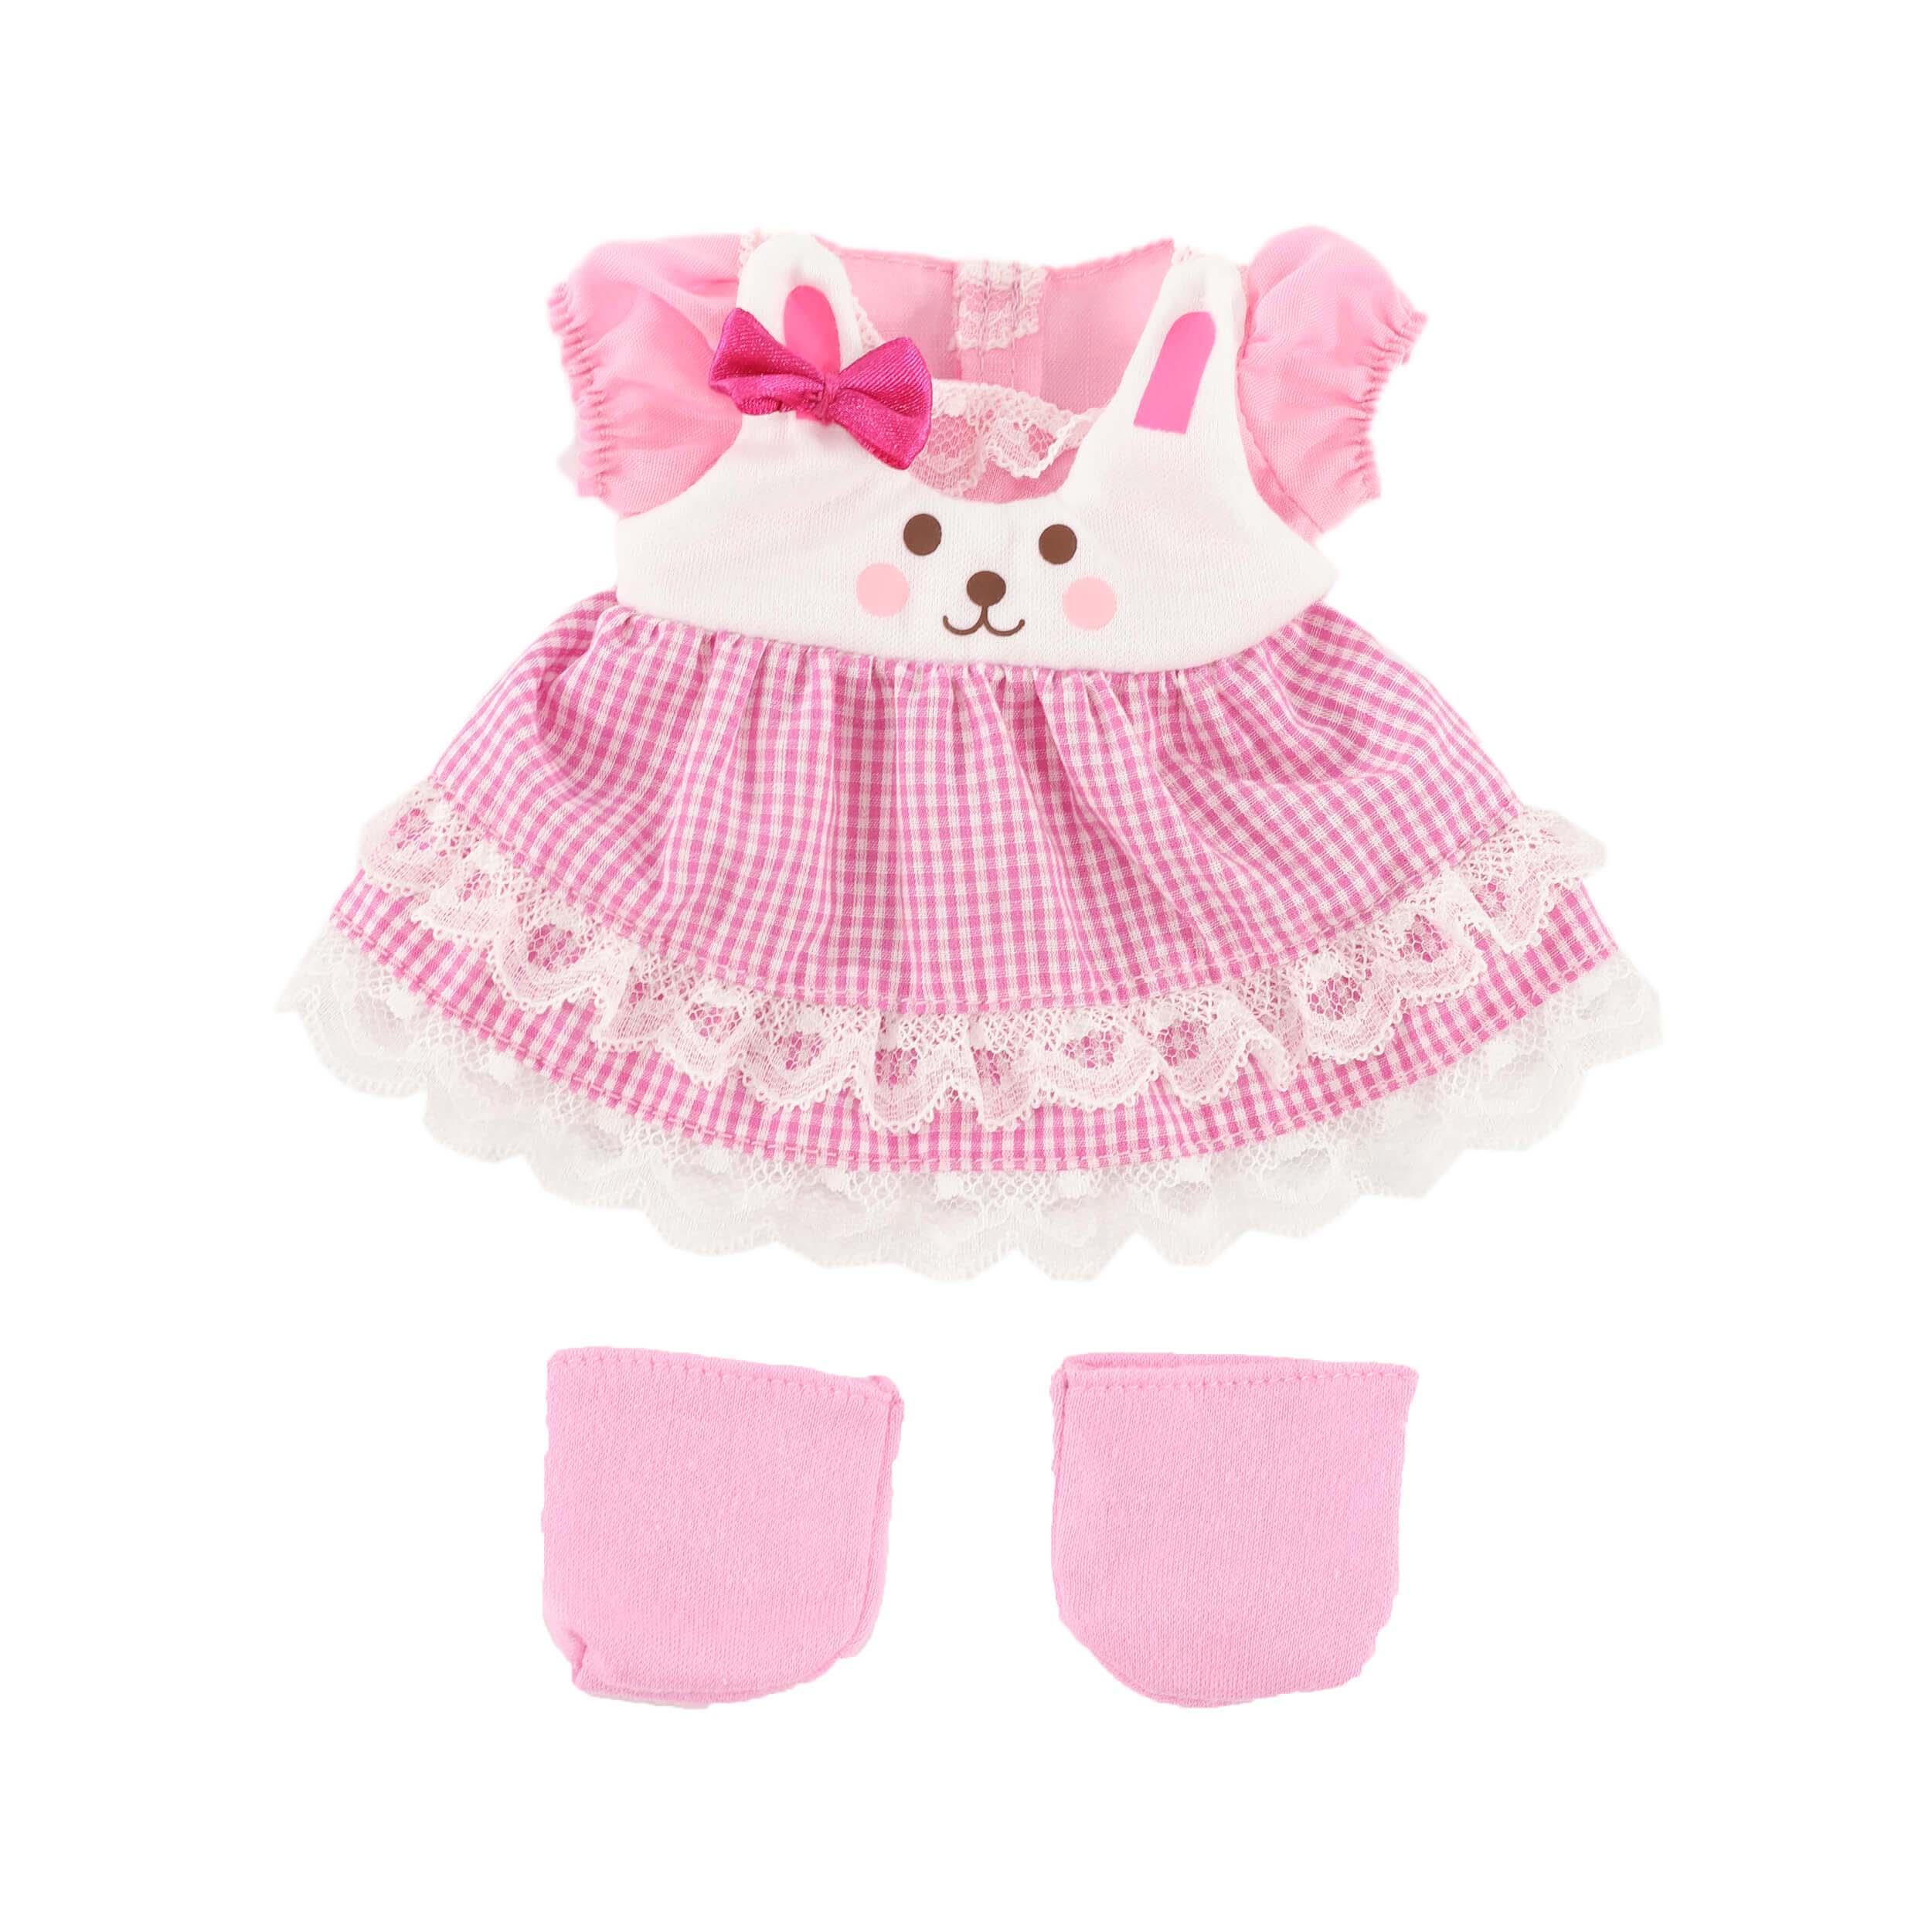 Комплект одежды Зайка для куклы Мелл